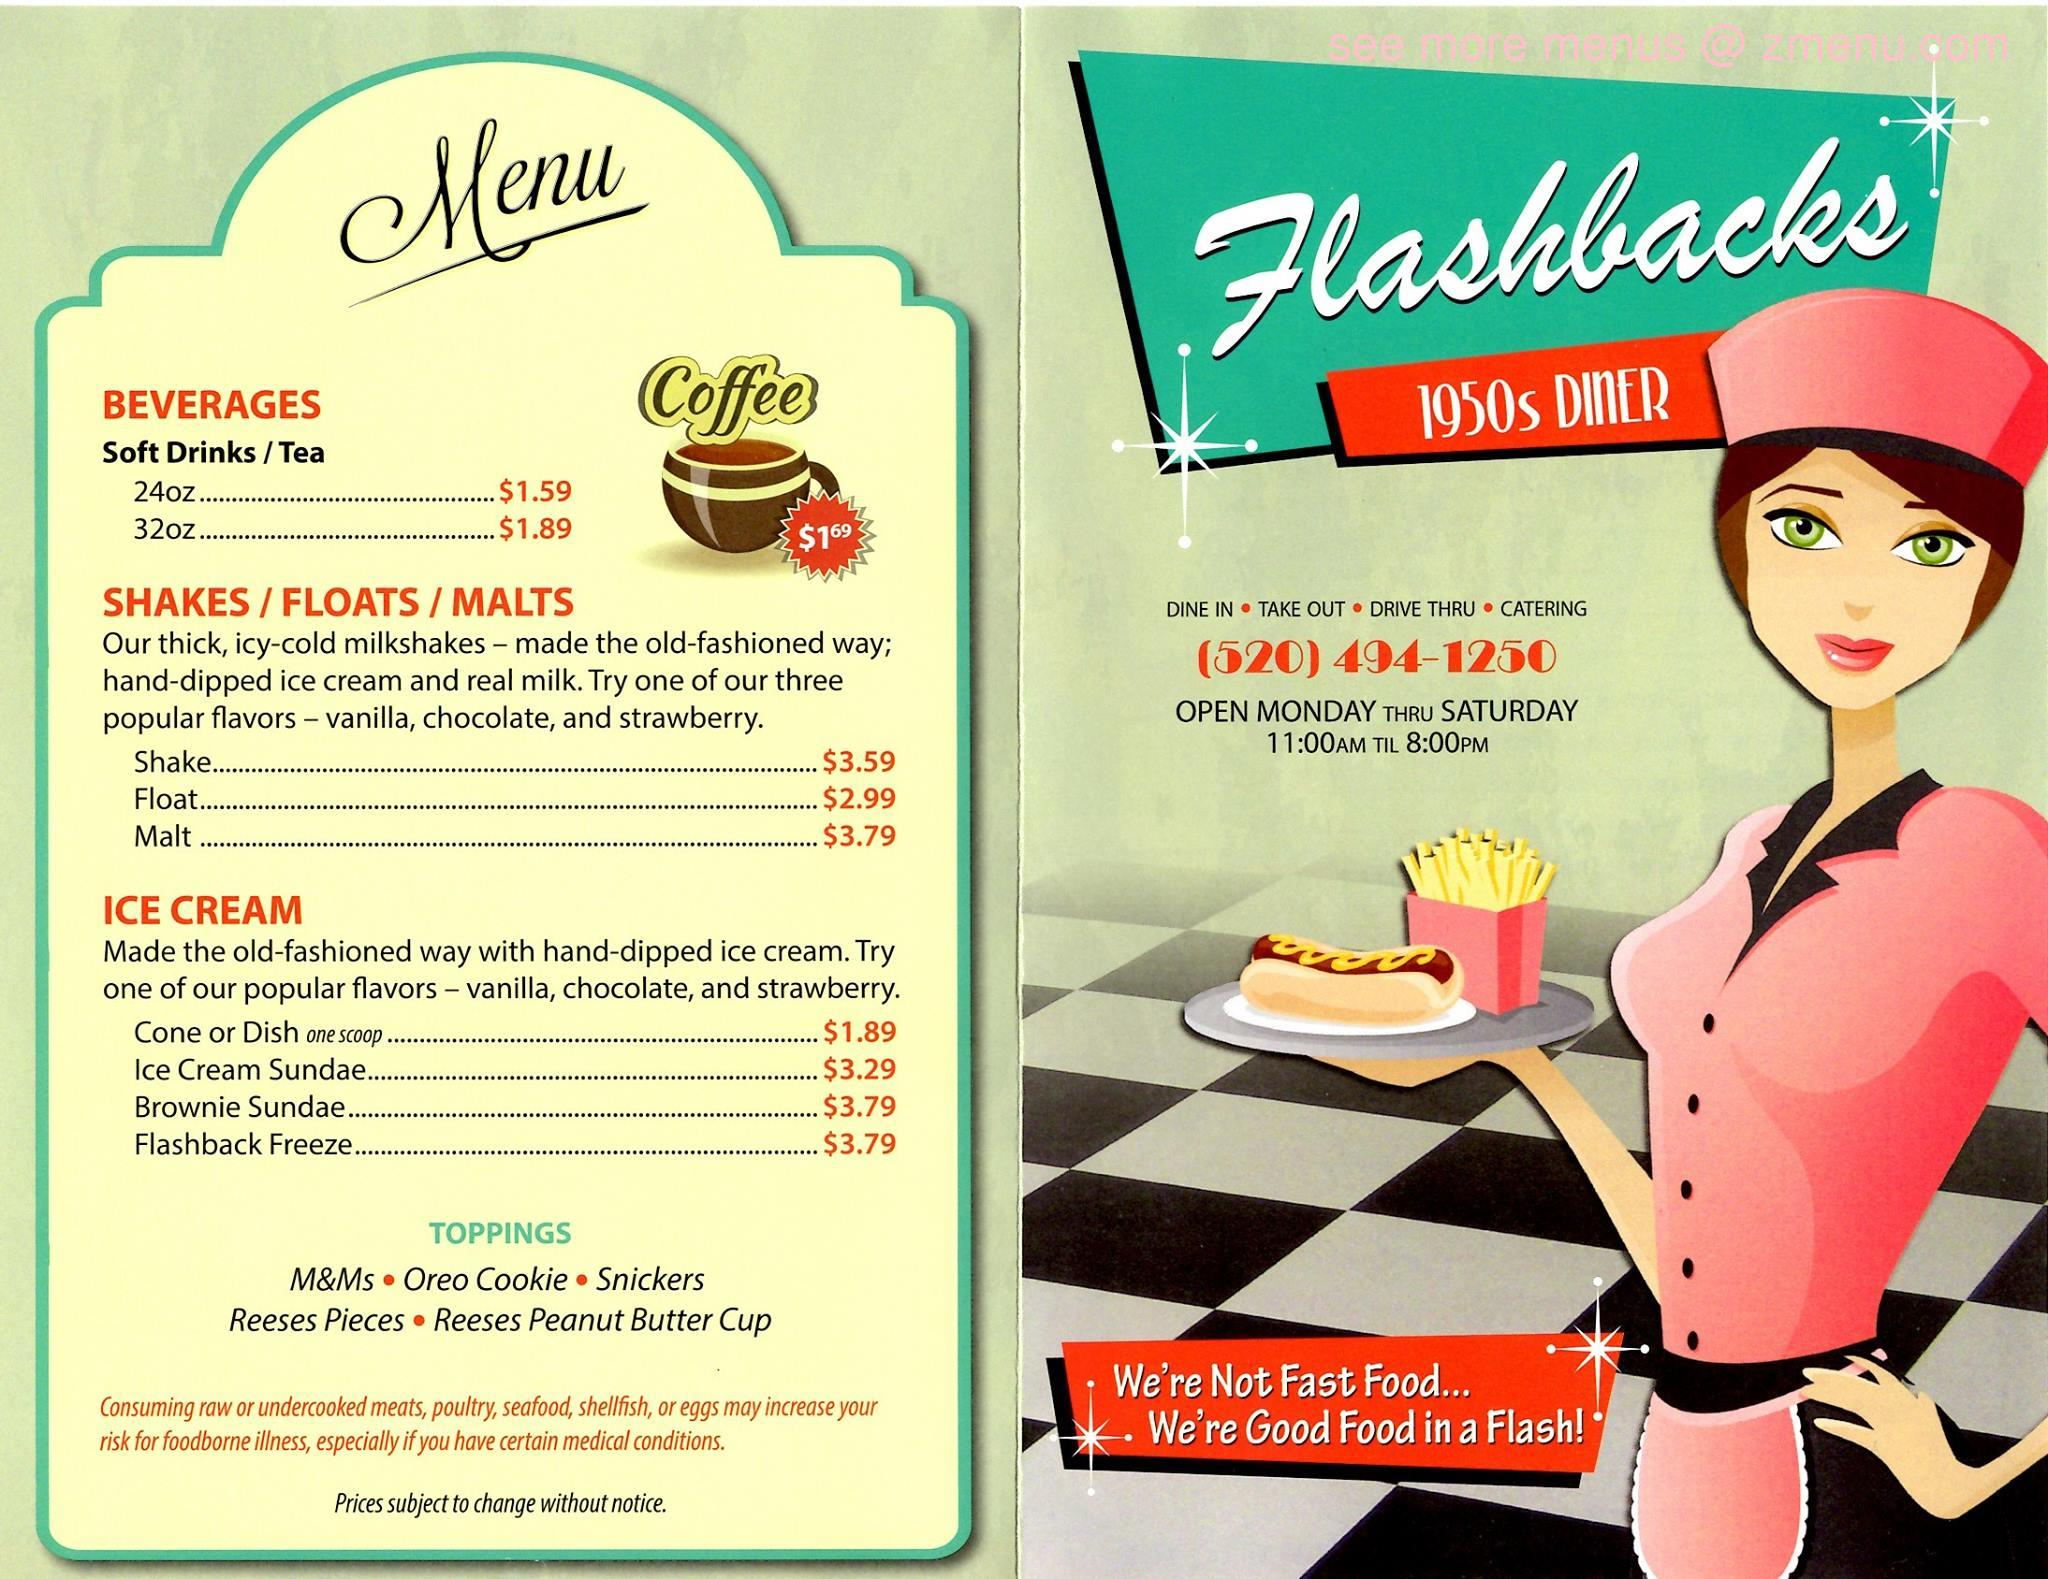 Online Menu of Flashbacks Diner Restaurant, Arizona City